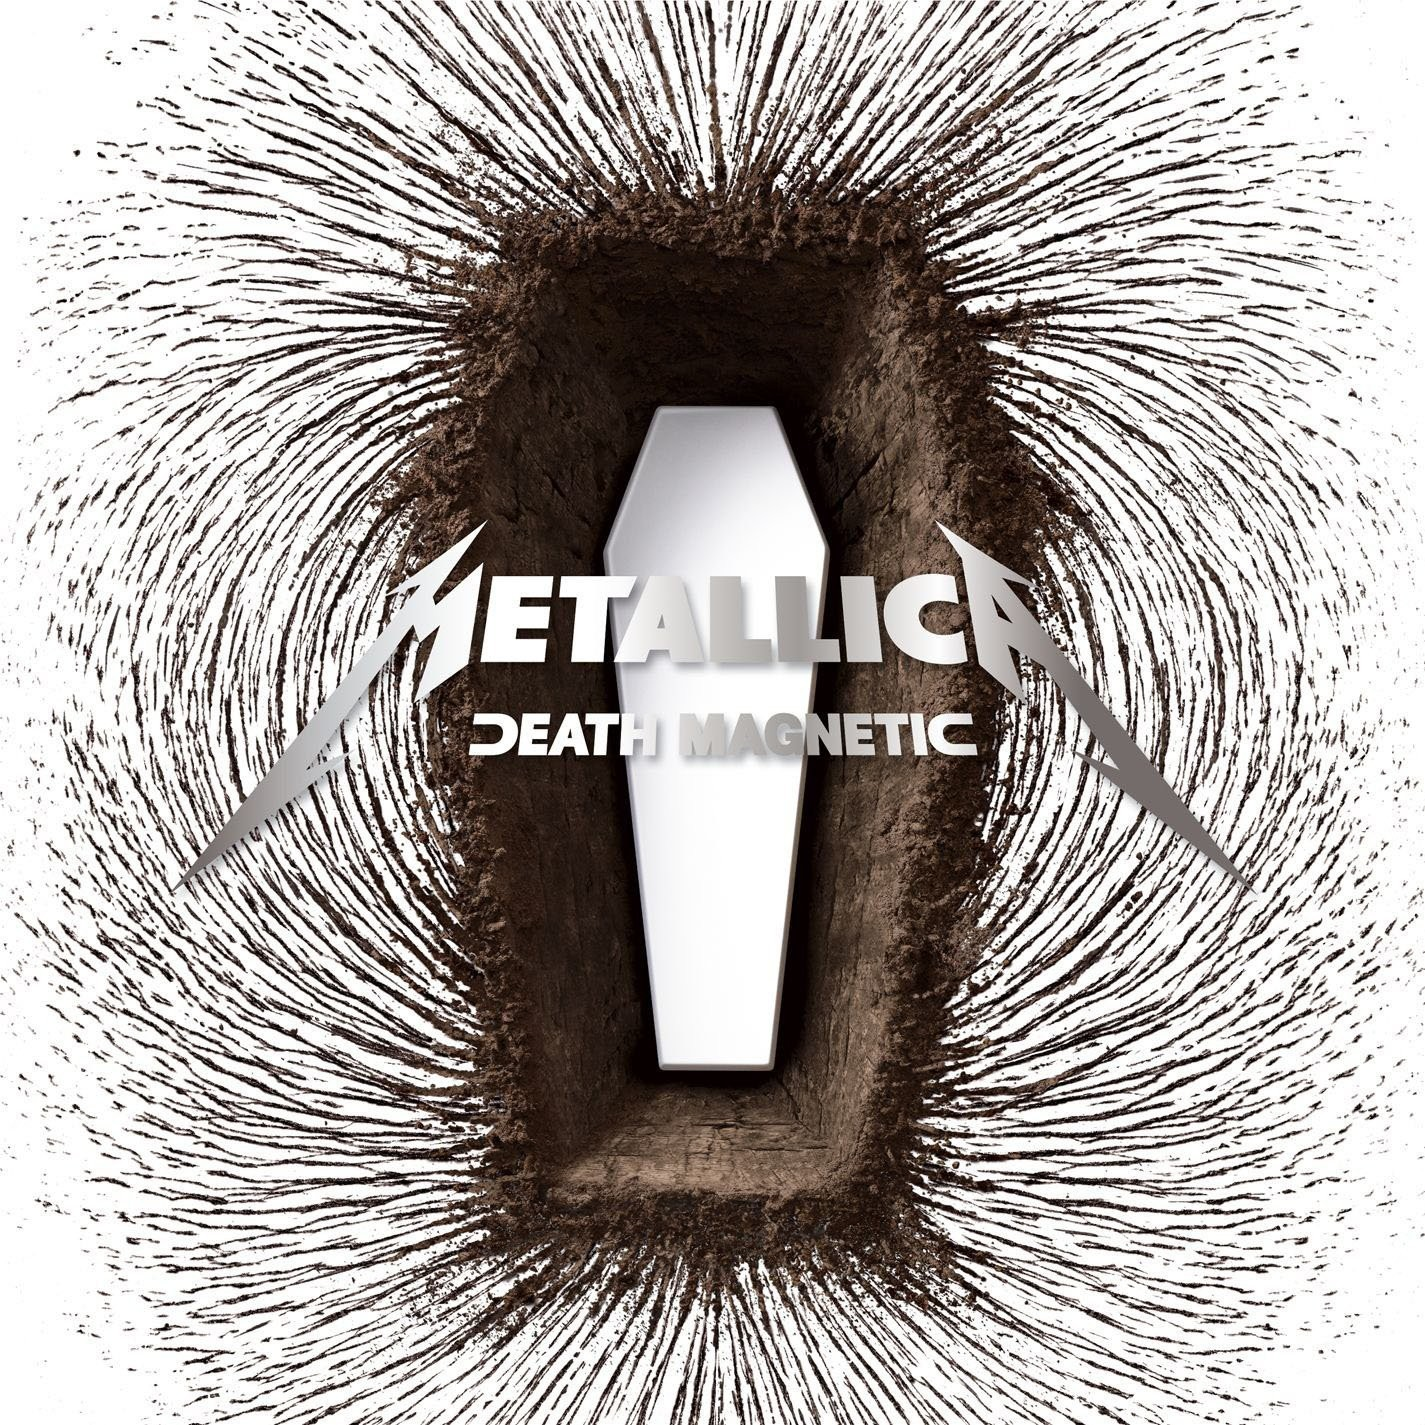 Metallica 'Death Magnetic' Turns 10 - Stereogum